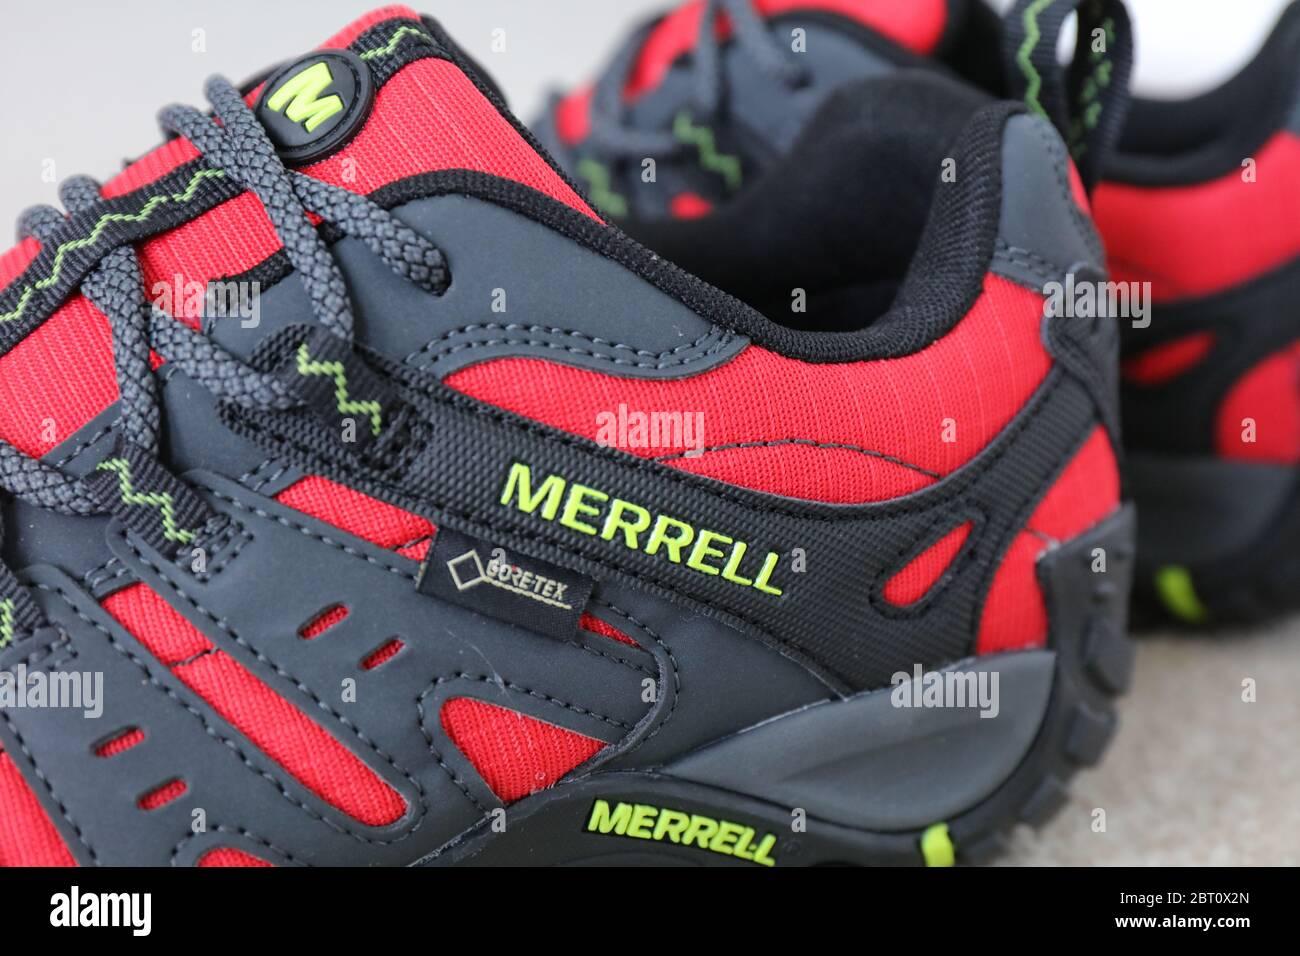 A Pair of a Merrell Red Accentor Sport